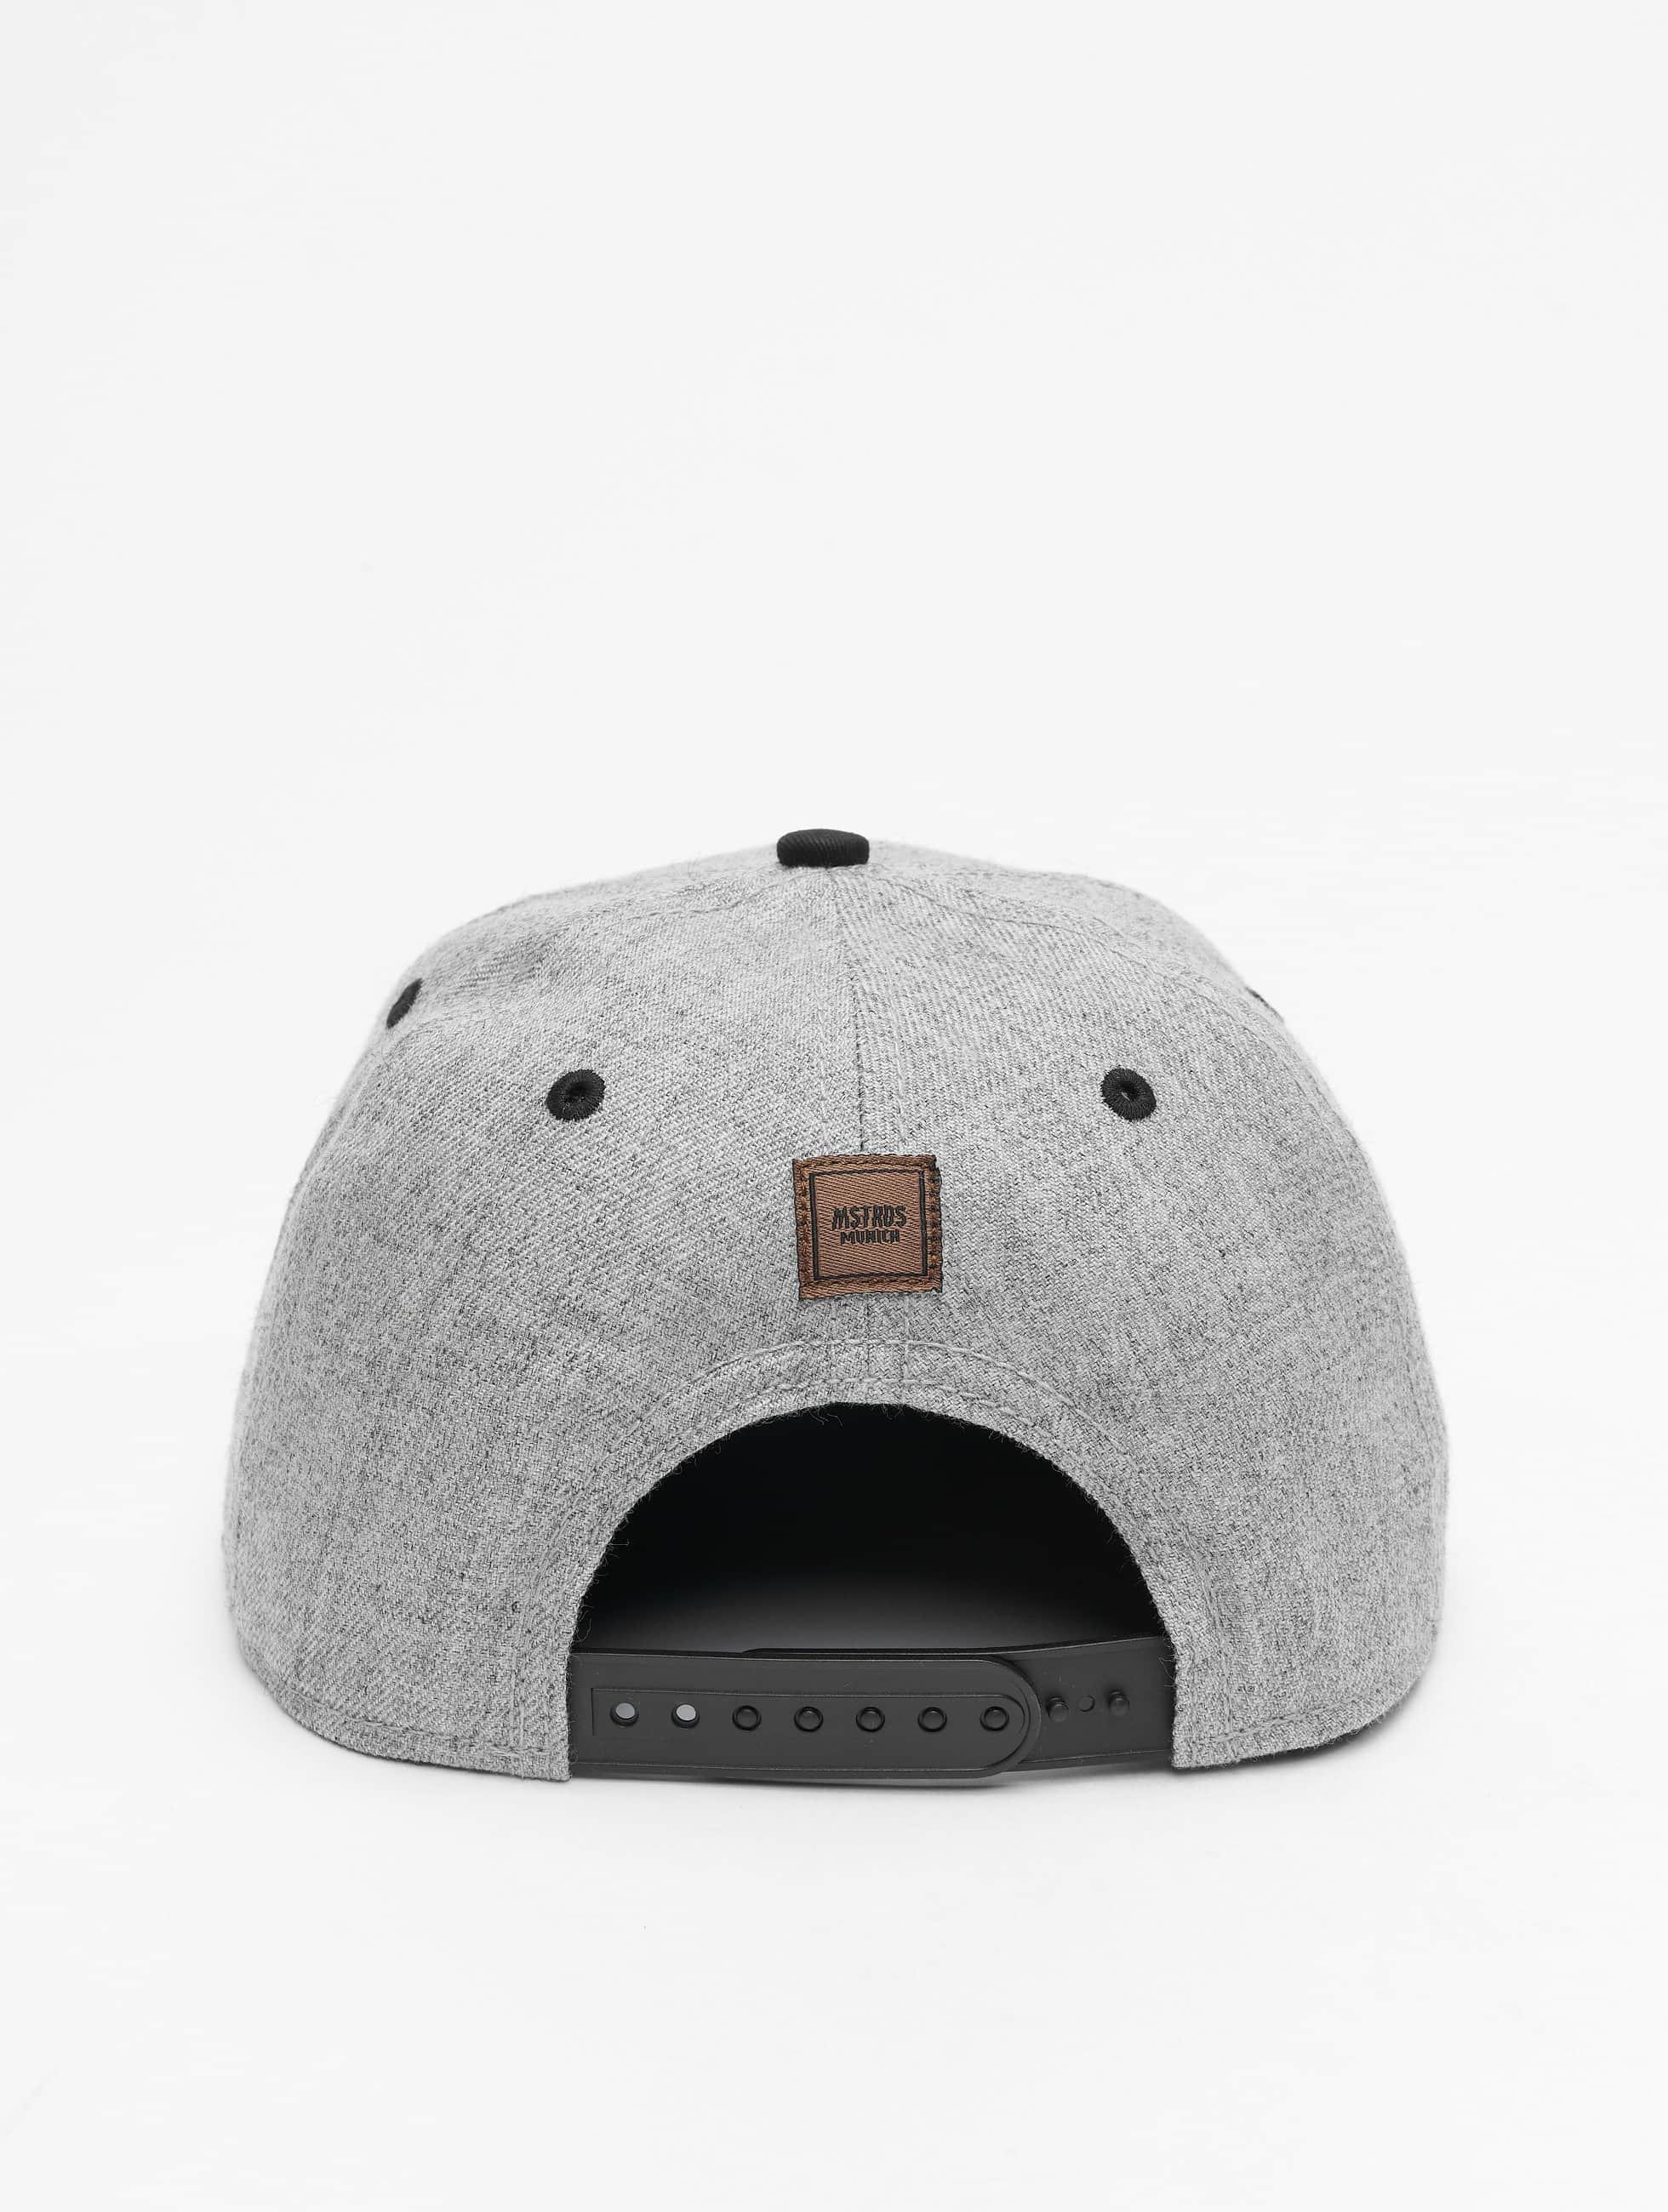 MSTRDS Casquette Snapback & Strapback W Letter gris